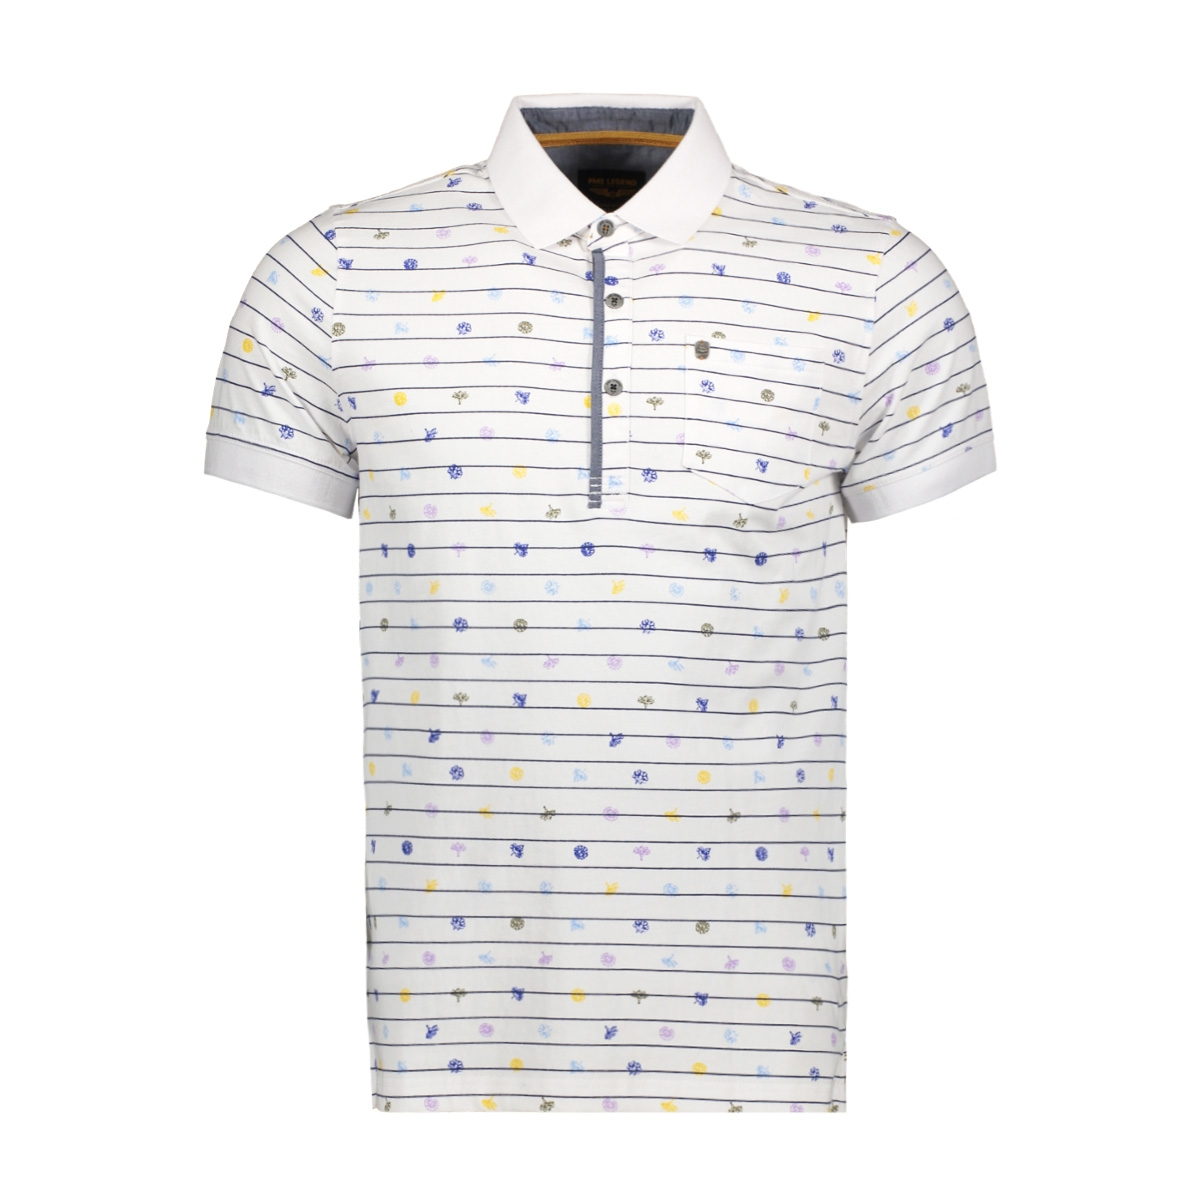 shortsleeve polo shirt ppss194868 pme legend polo 7003